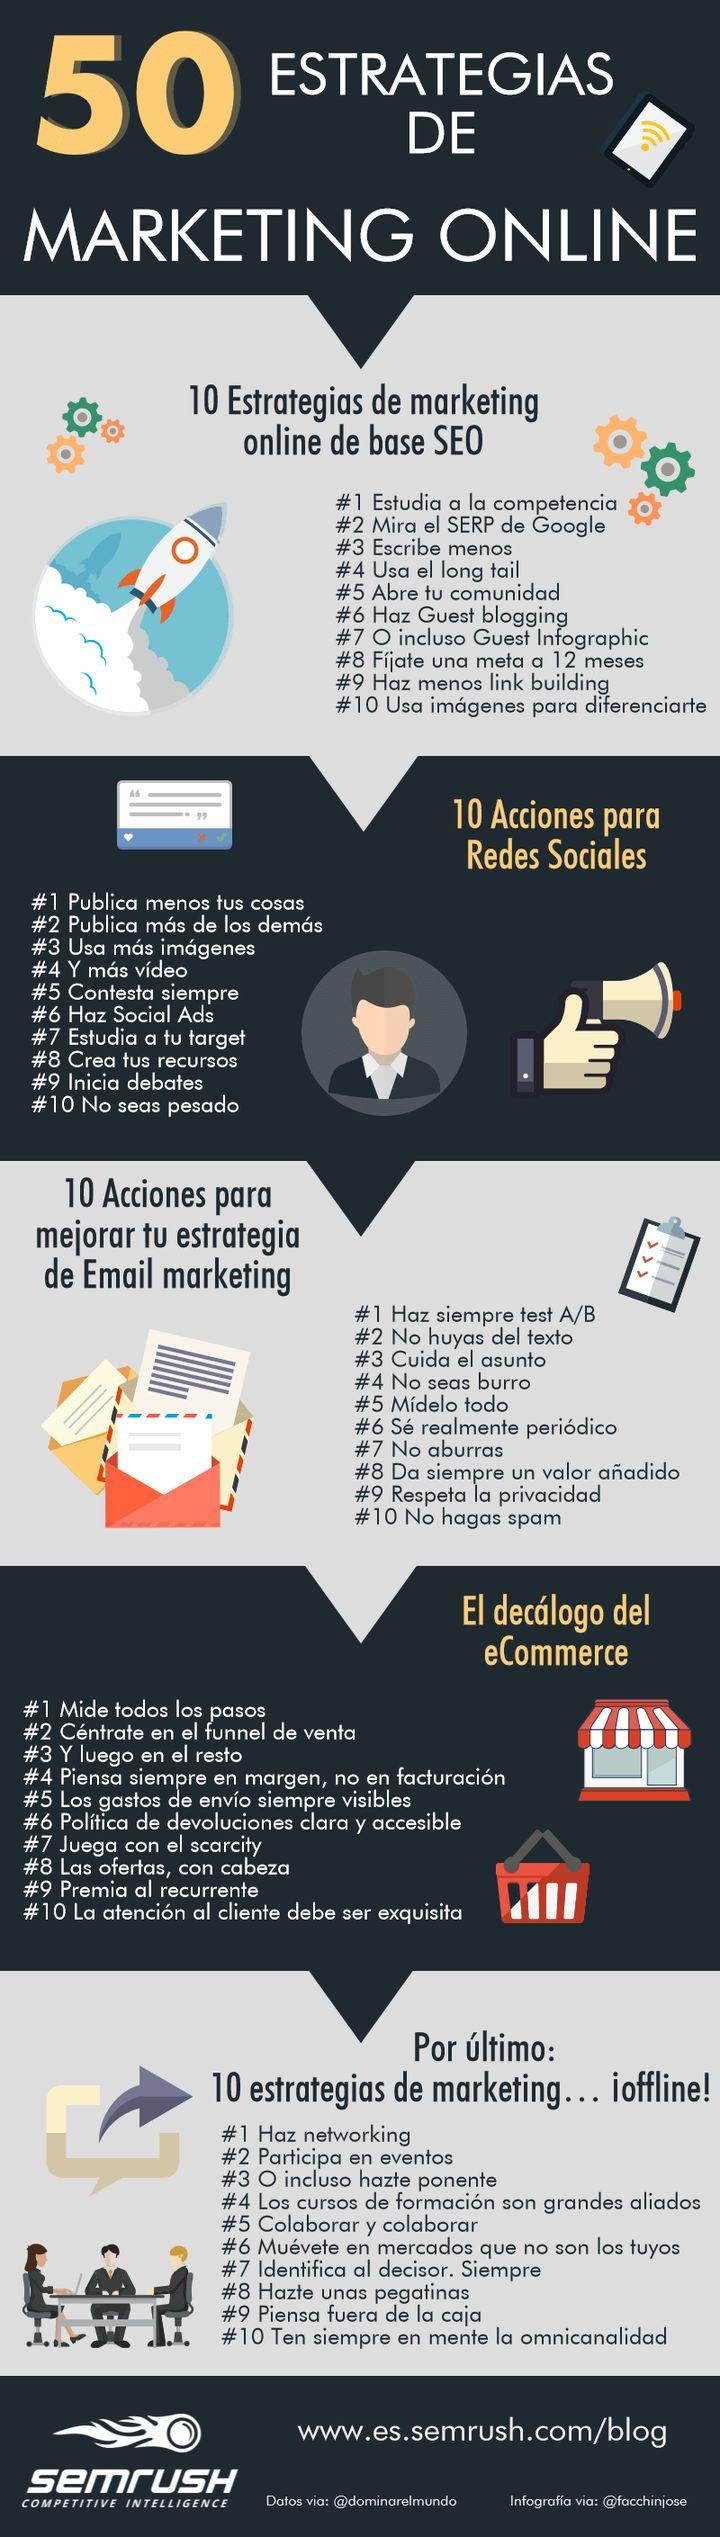 50_estrategias_marketing_online-infografia.png (720×2537)